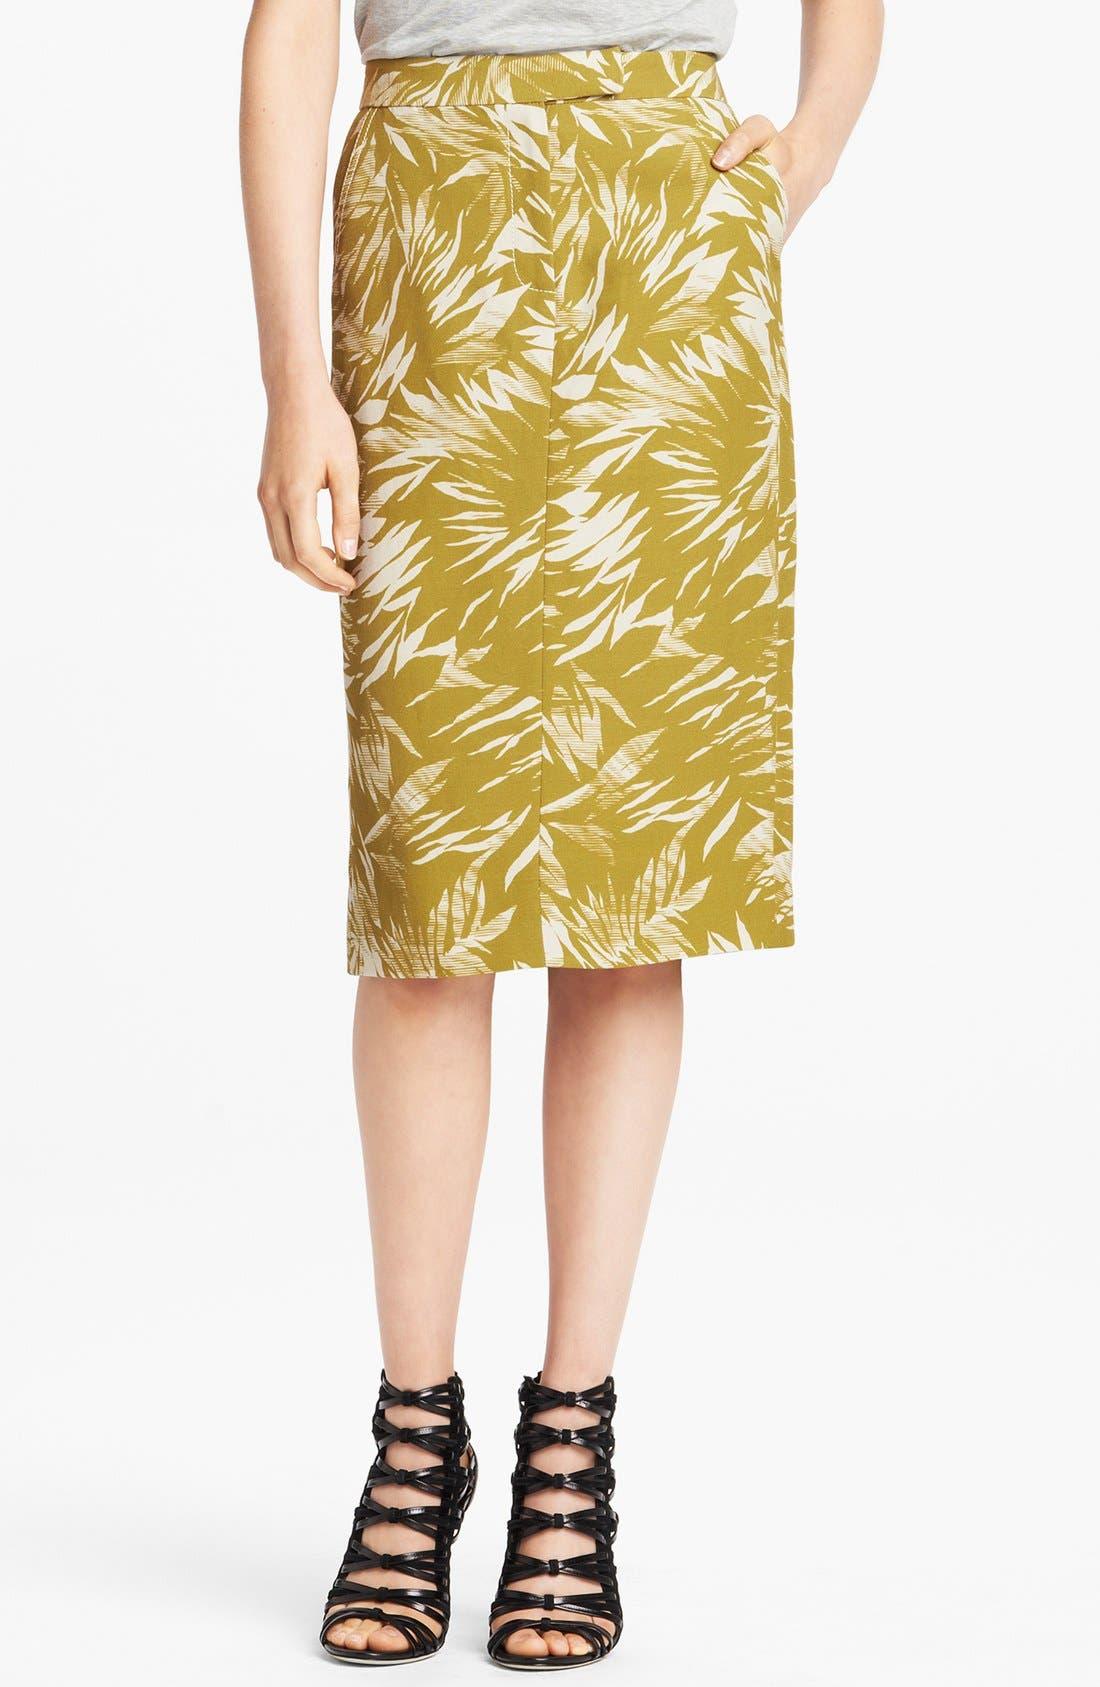 Alternate Image 1 Selected - Jason Wu Botanical Print Linen Crepe Skirt